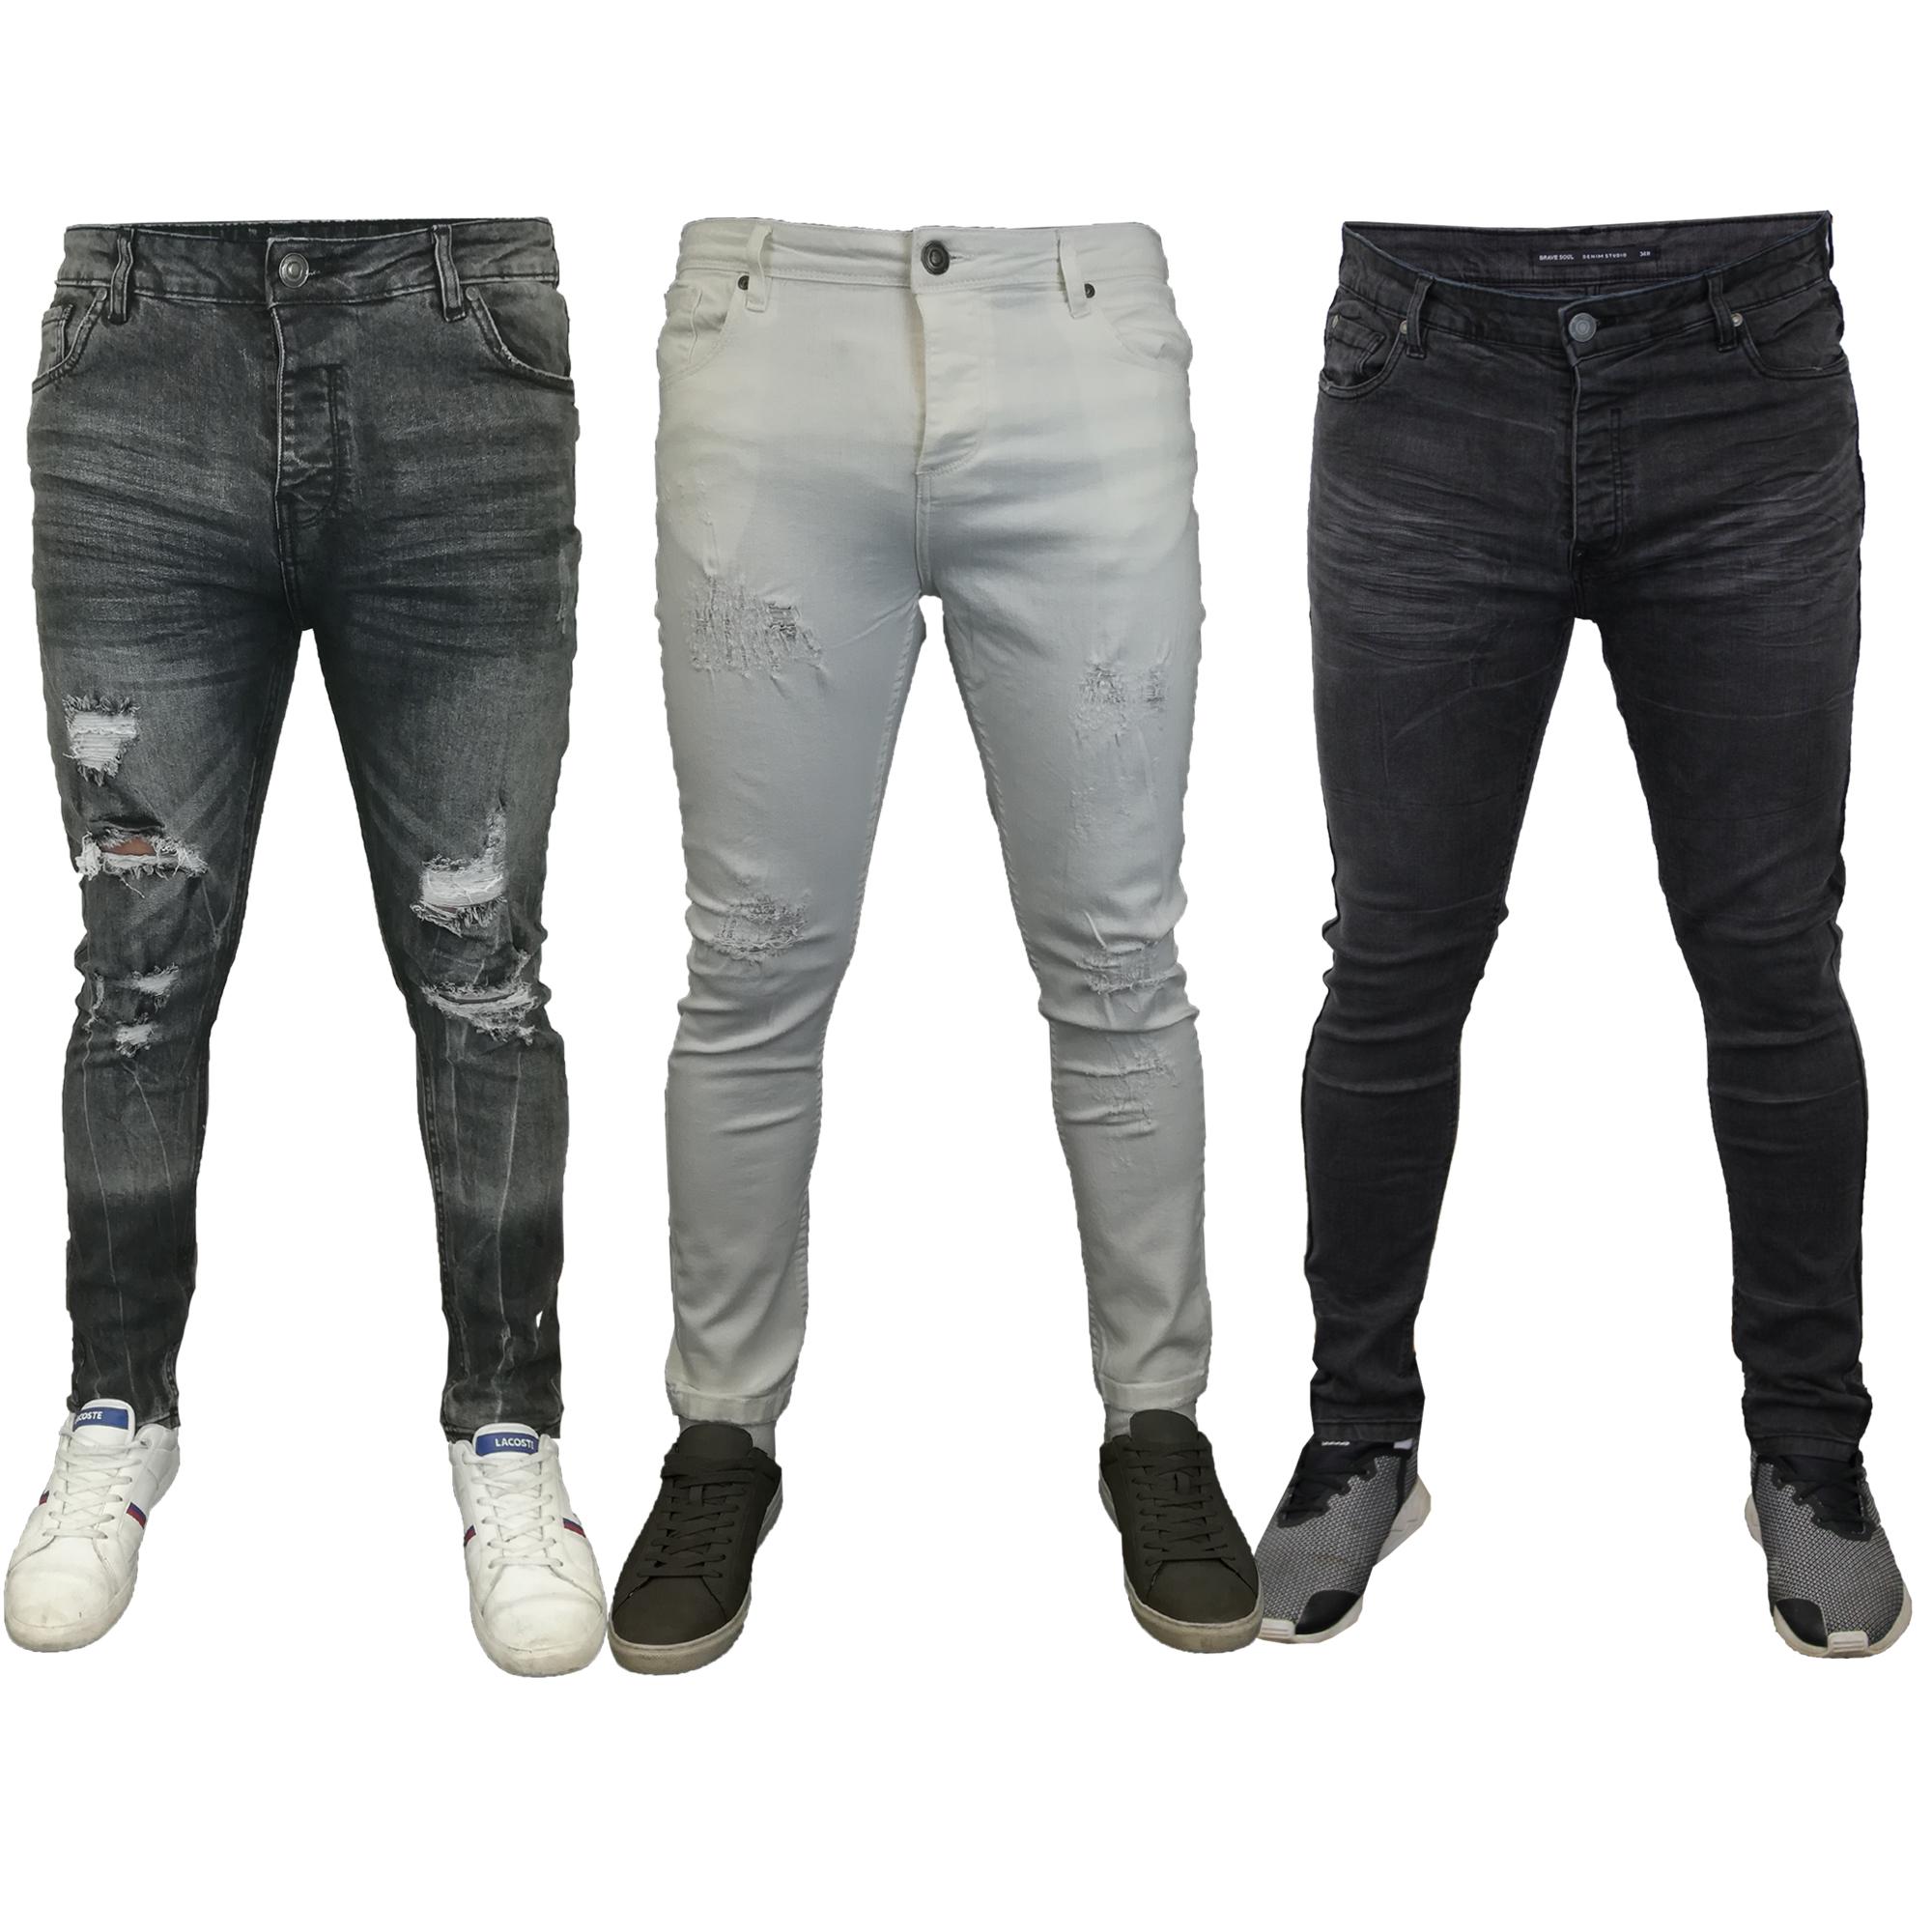 Mens SOUL Super Skinny Stretch Denim Designer Distress Ripped Repair Slim Jeans